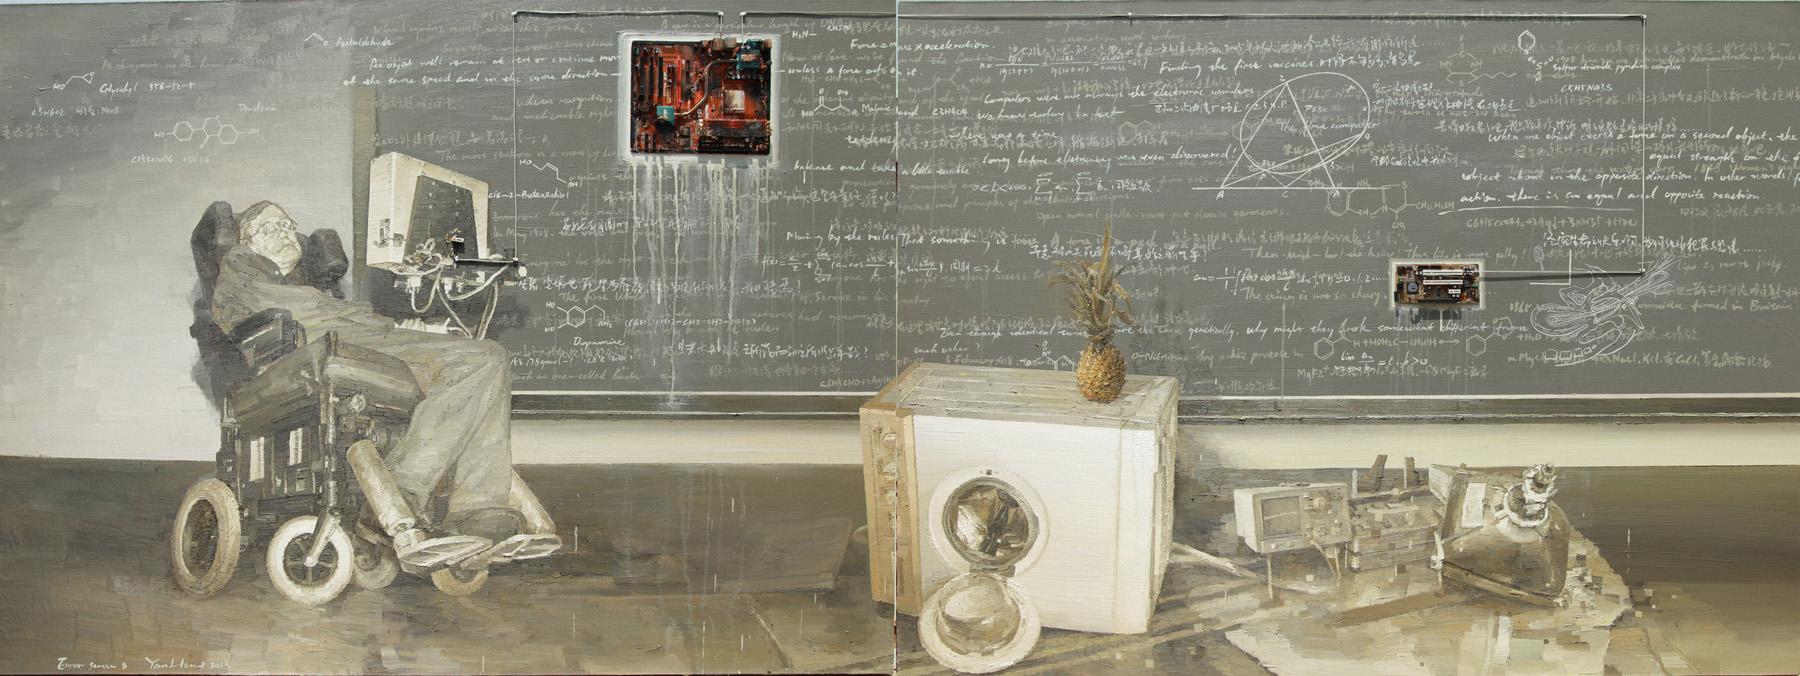 Yan Heng 闫珩, Black Screen No.8 黑屏 8, 2013, Mixed media and oil on canvas 布面油画装置, 150 x 400 cm